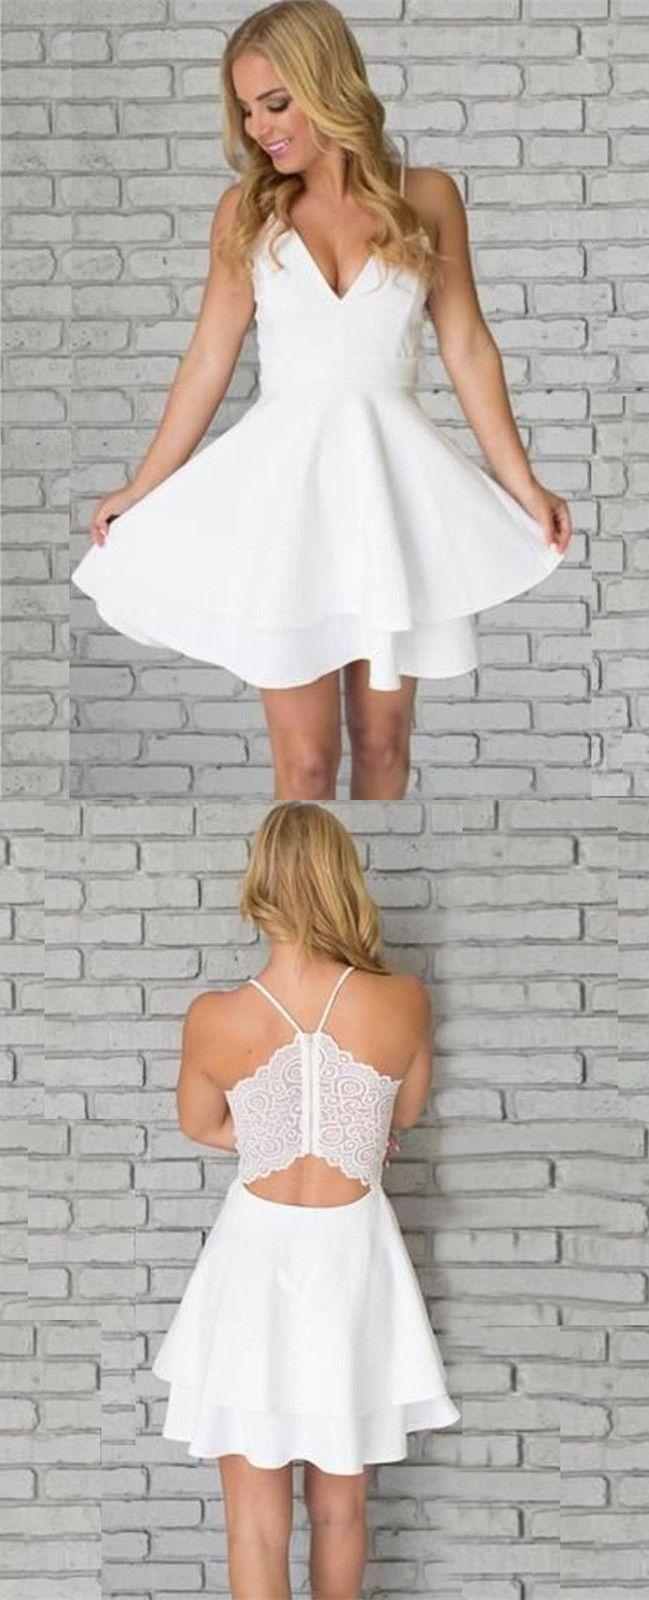 white homecoming dress, short homecoming dress, 2017 homecoming dress, spaghetti straps homecoming dress